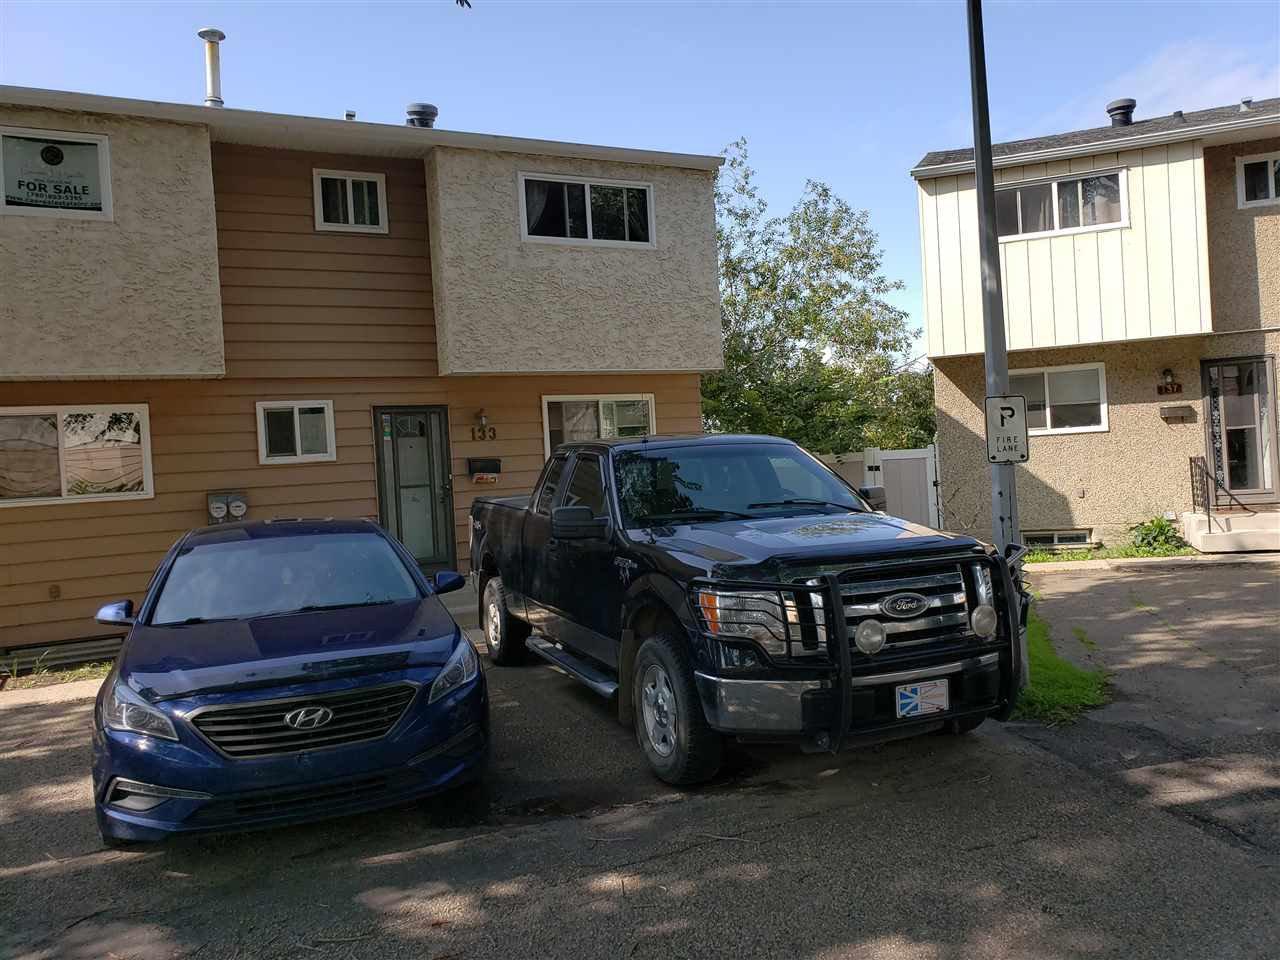 Main Photo: 133 HABITAT Crescent in Edmonton: Zone 35 Townhouse for sale : MLS®# E4169401